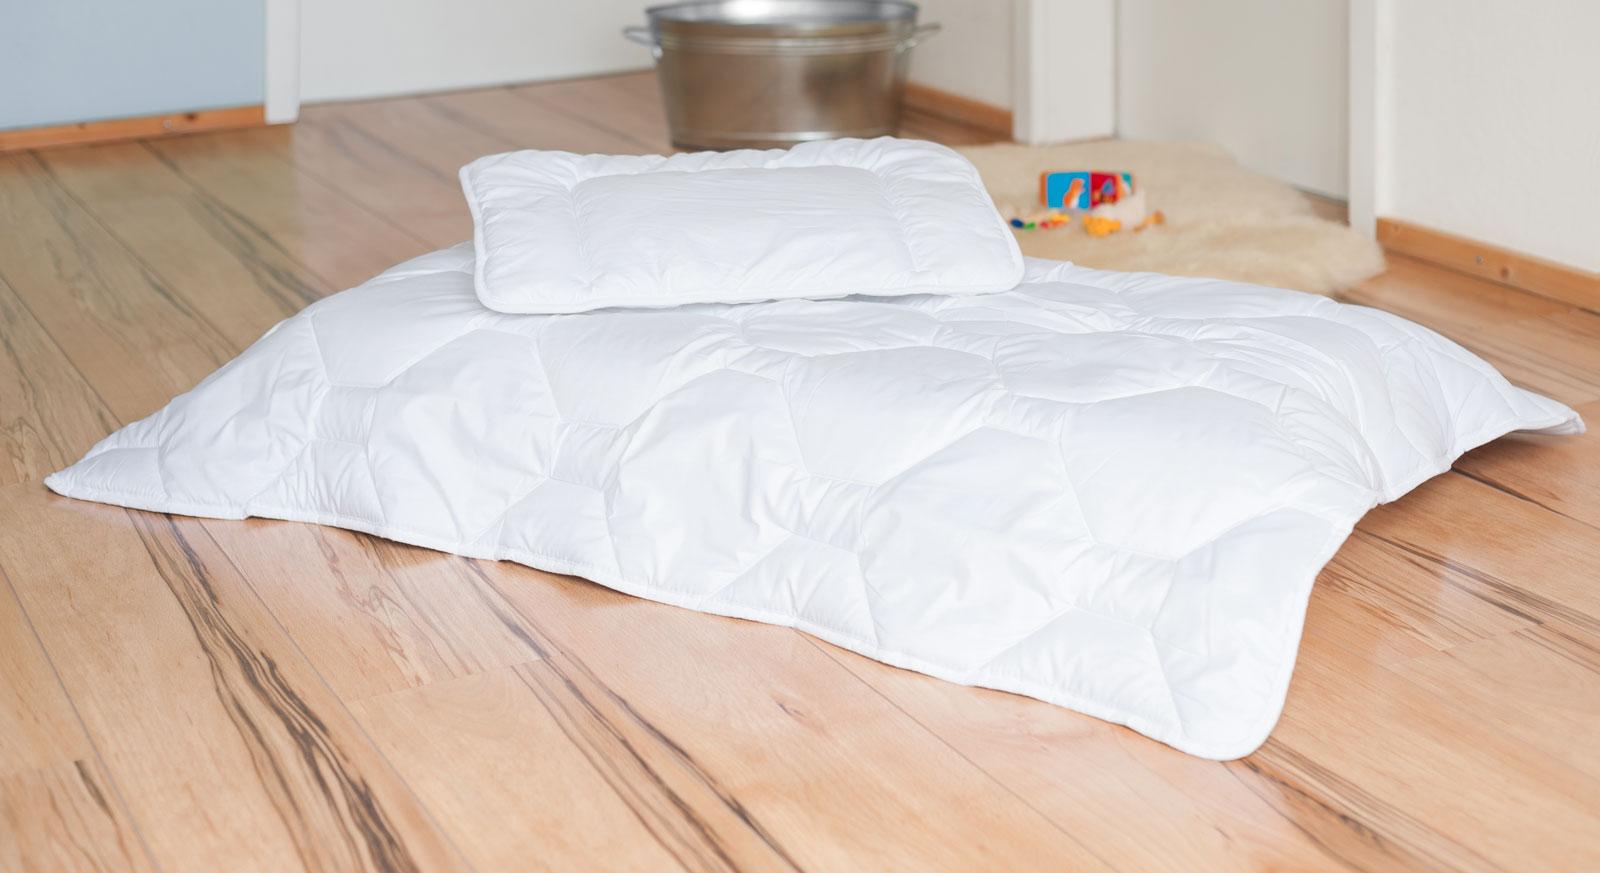 Warme Kinderbettdecke Und 40x60 Cm Großes Kissen Linus Winter